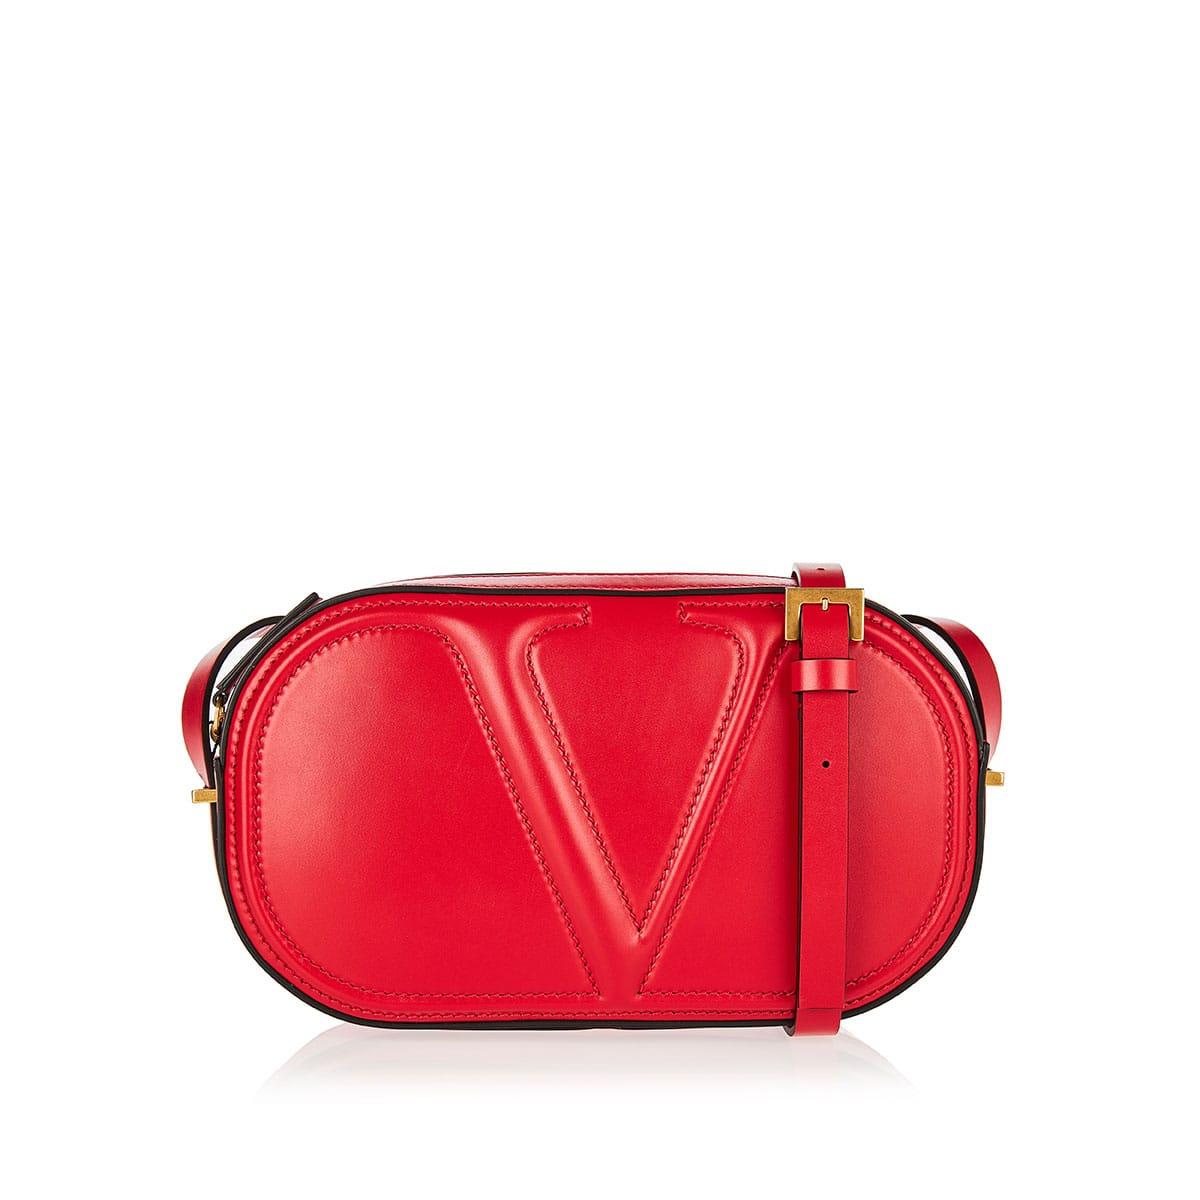 VLogo Walk crossbody bag